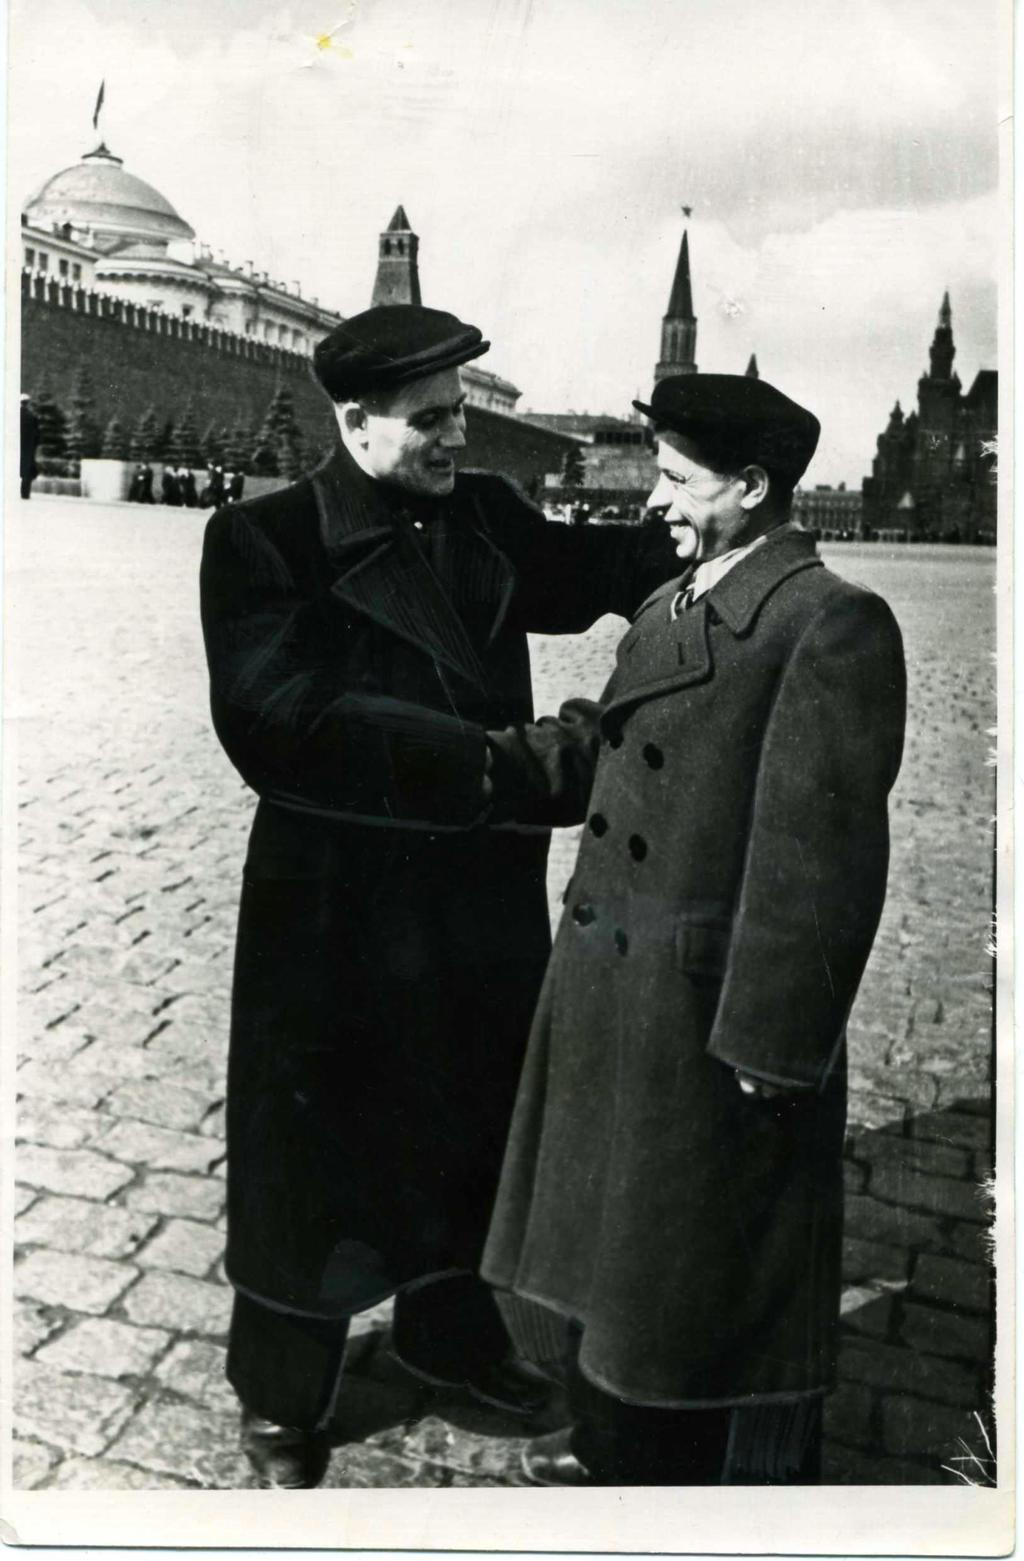 КП 28235-7 Фотография участников побега ©Tatfrontu.ru Photo Archive